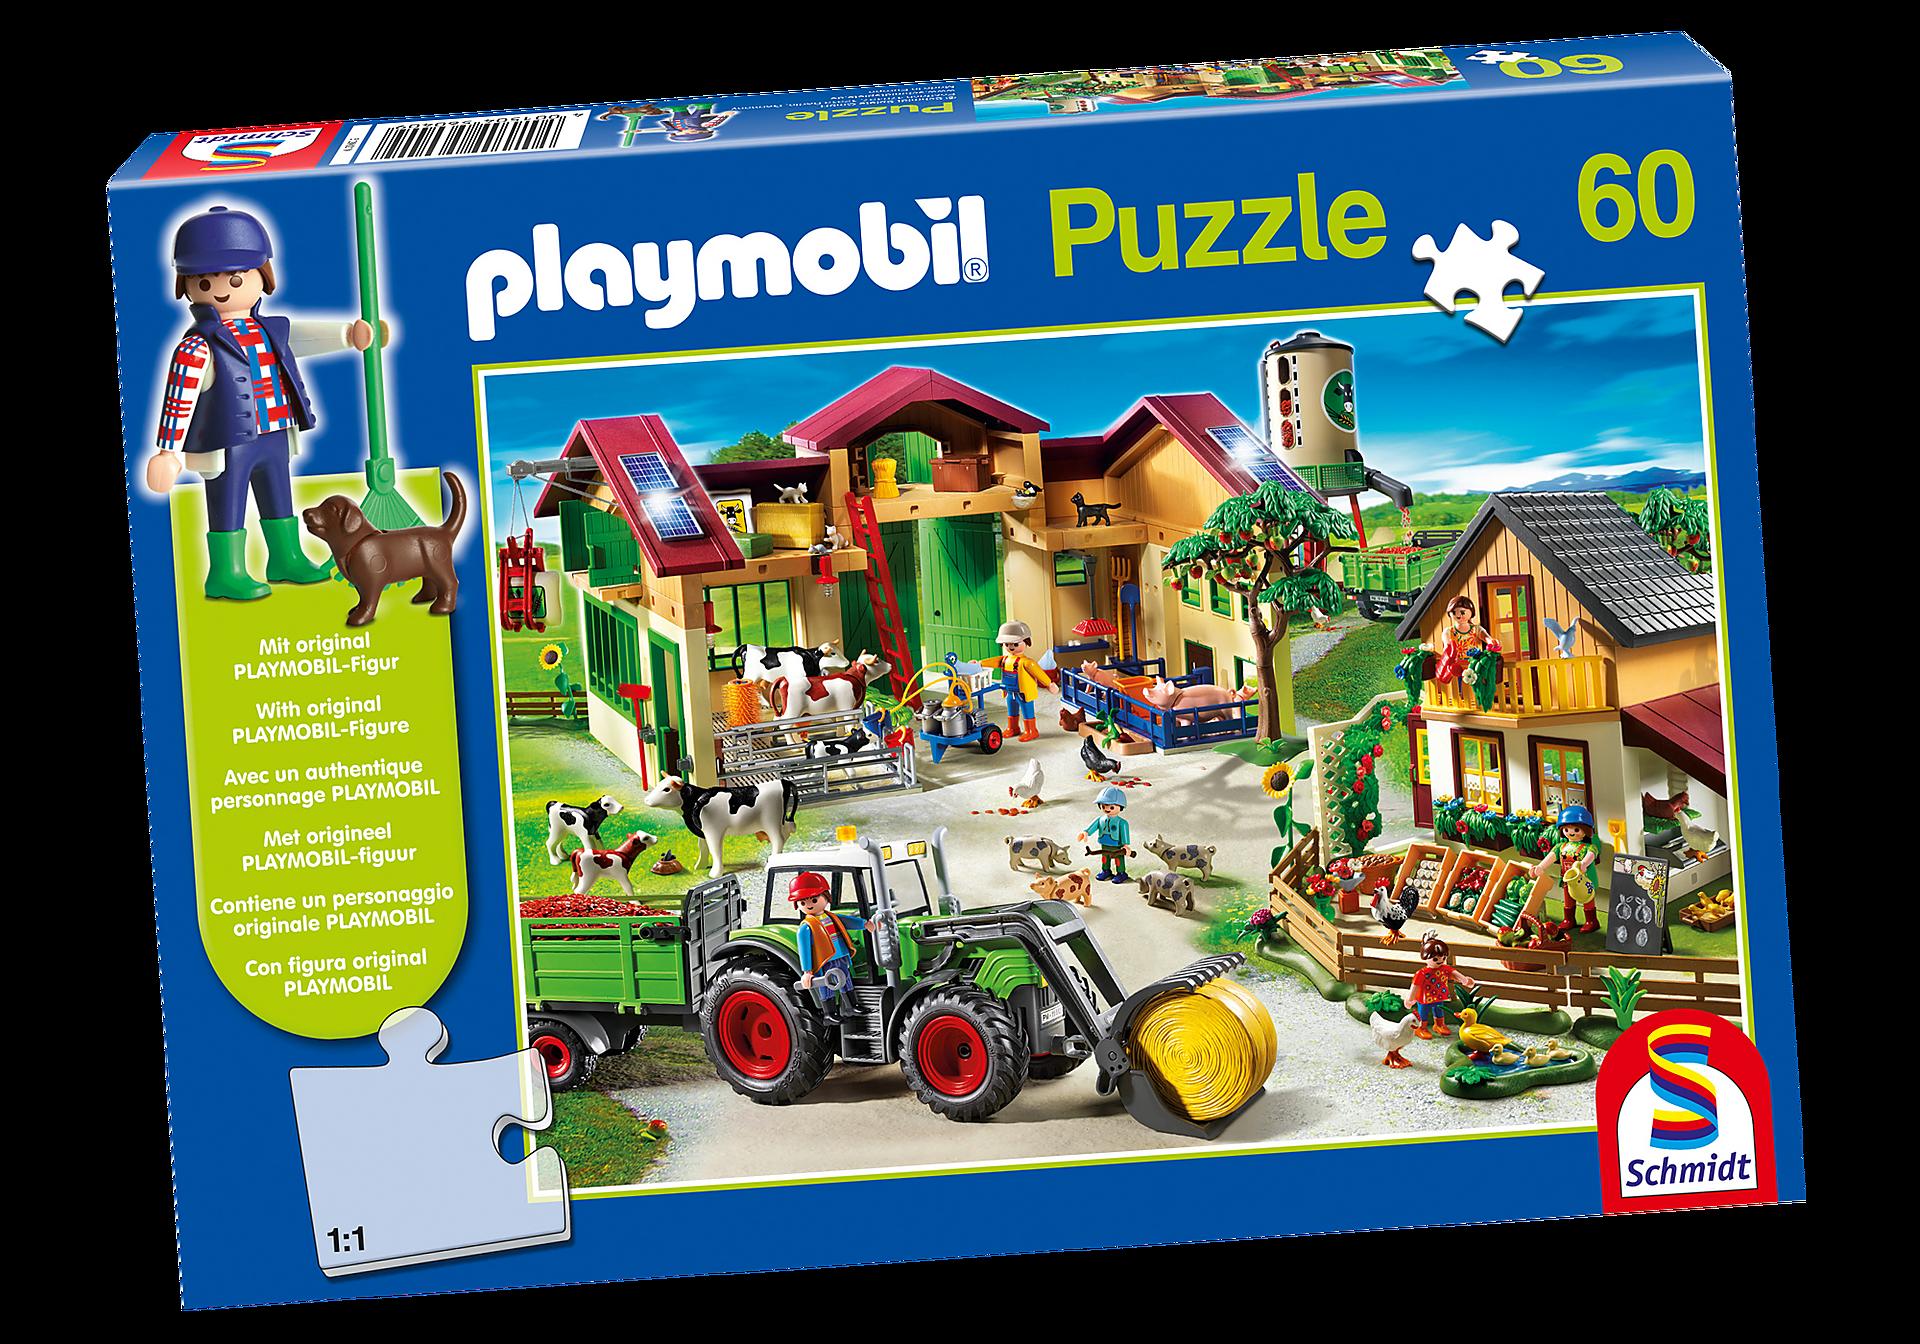 http://media.playmobil.com/i/playmobil/80352_product_detail/Puzzle Quinta (60 peças)